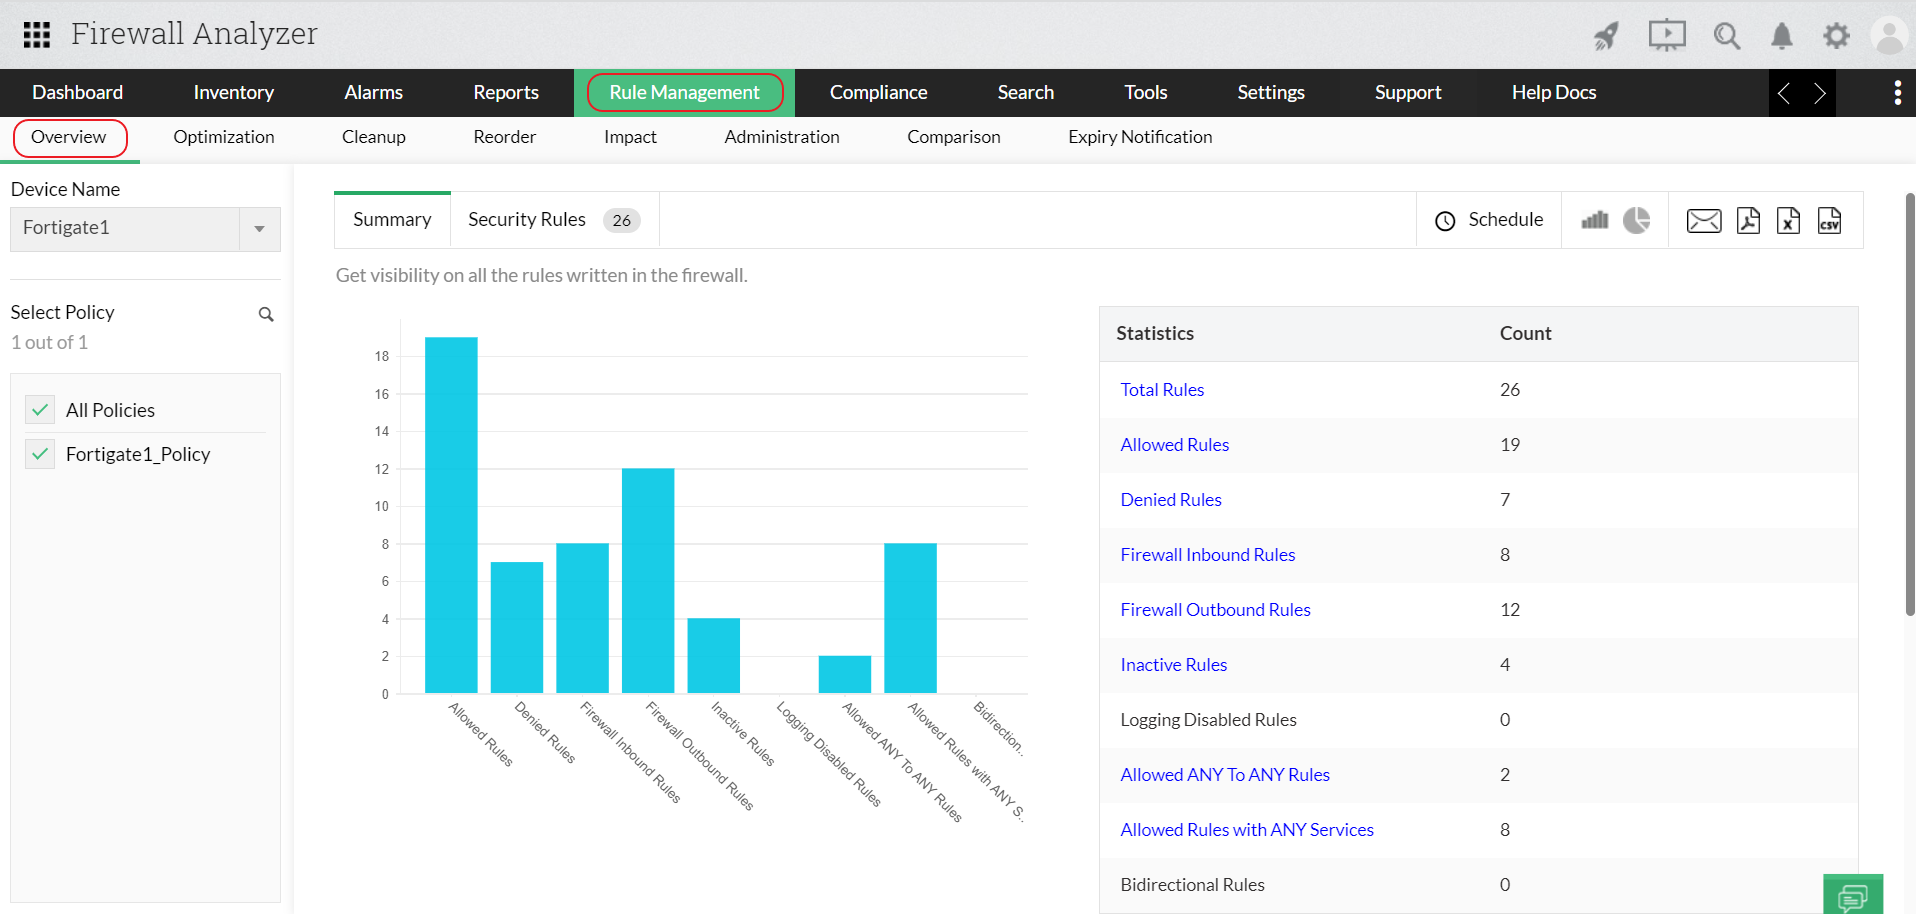 Firewall Policy Rules - ManageEngine Firewall Analyzer